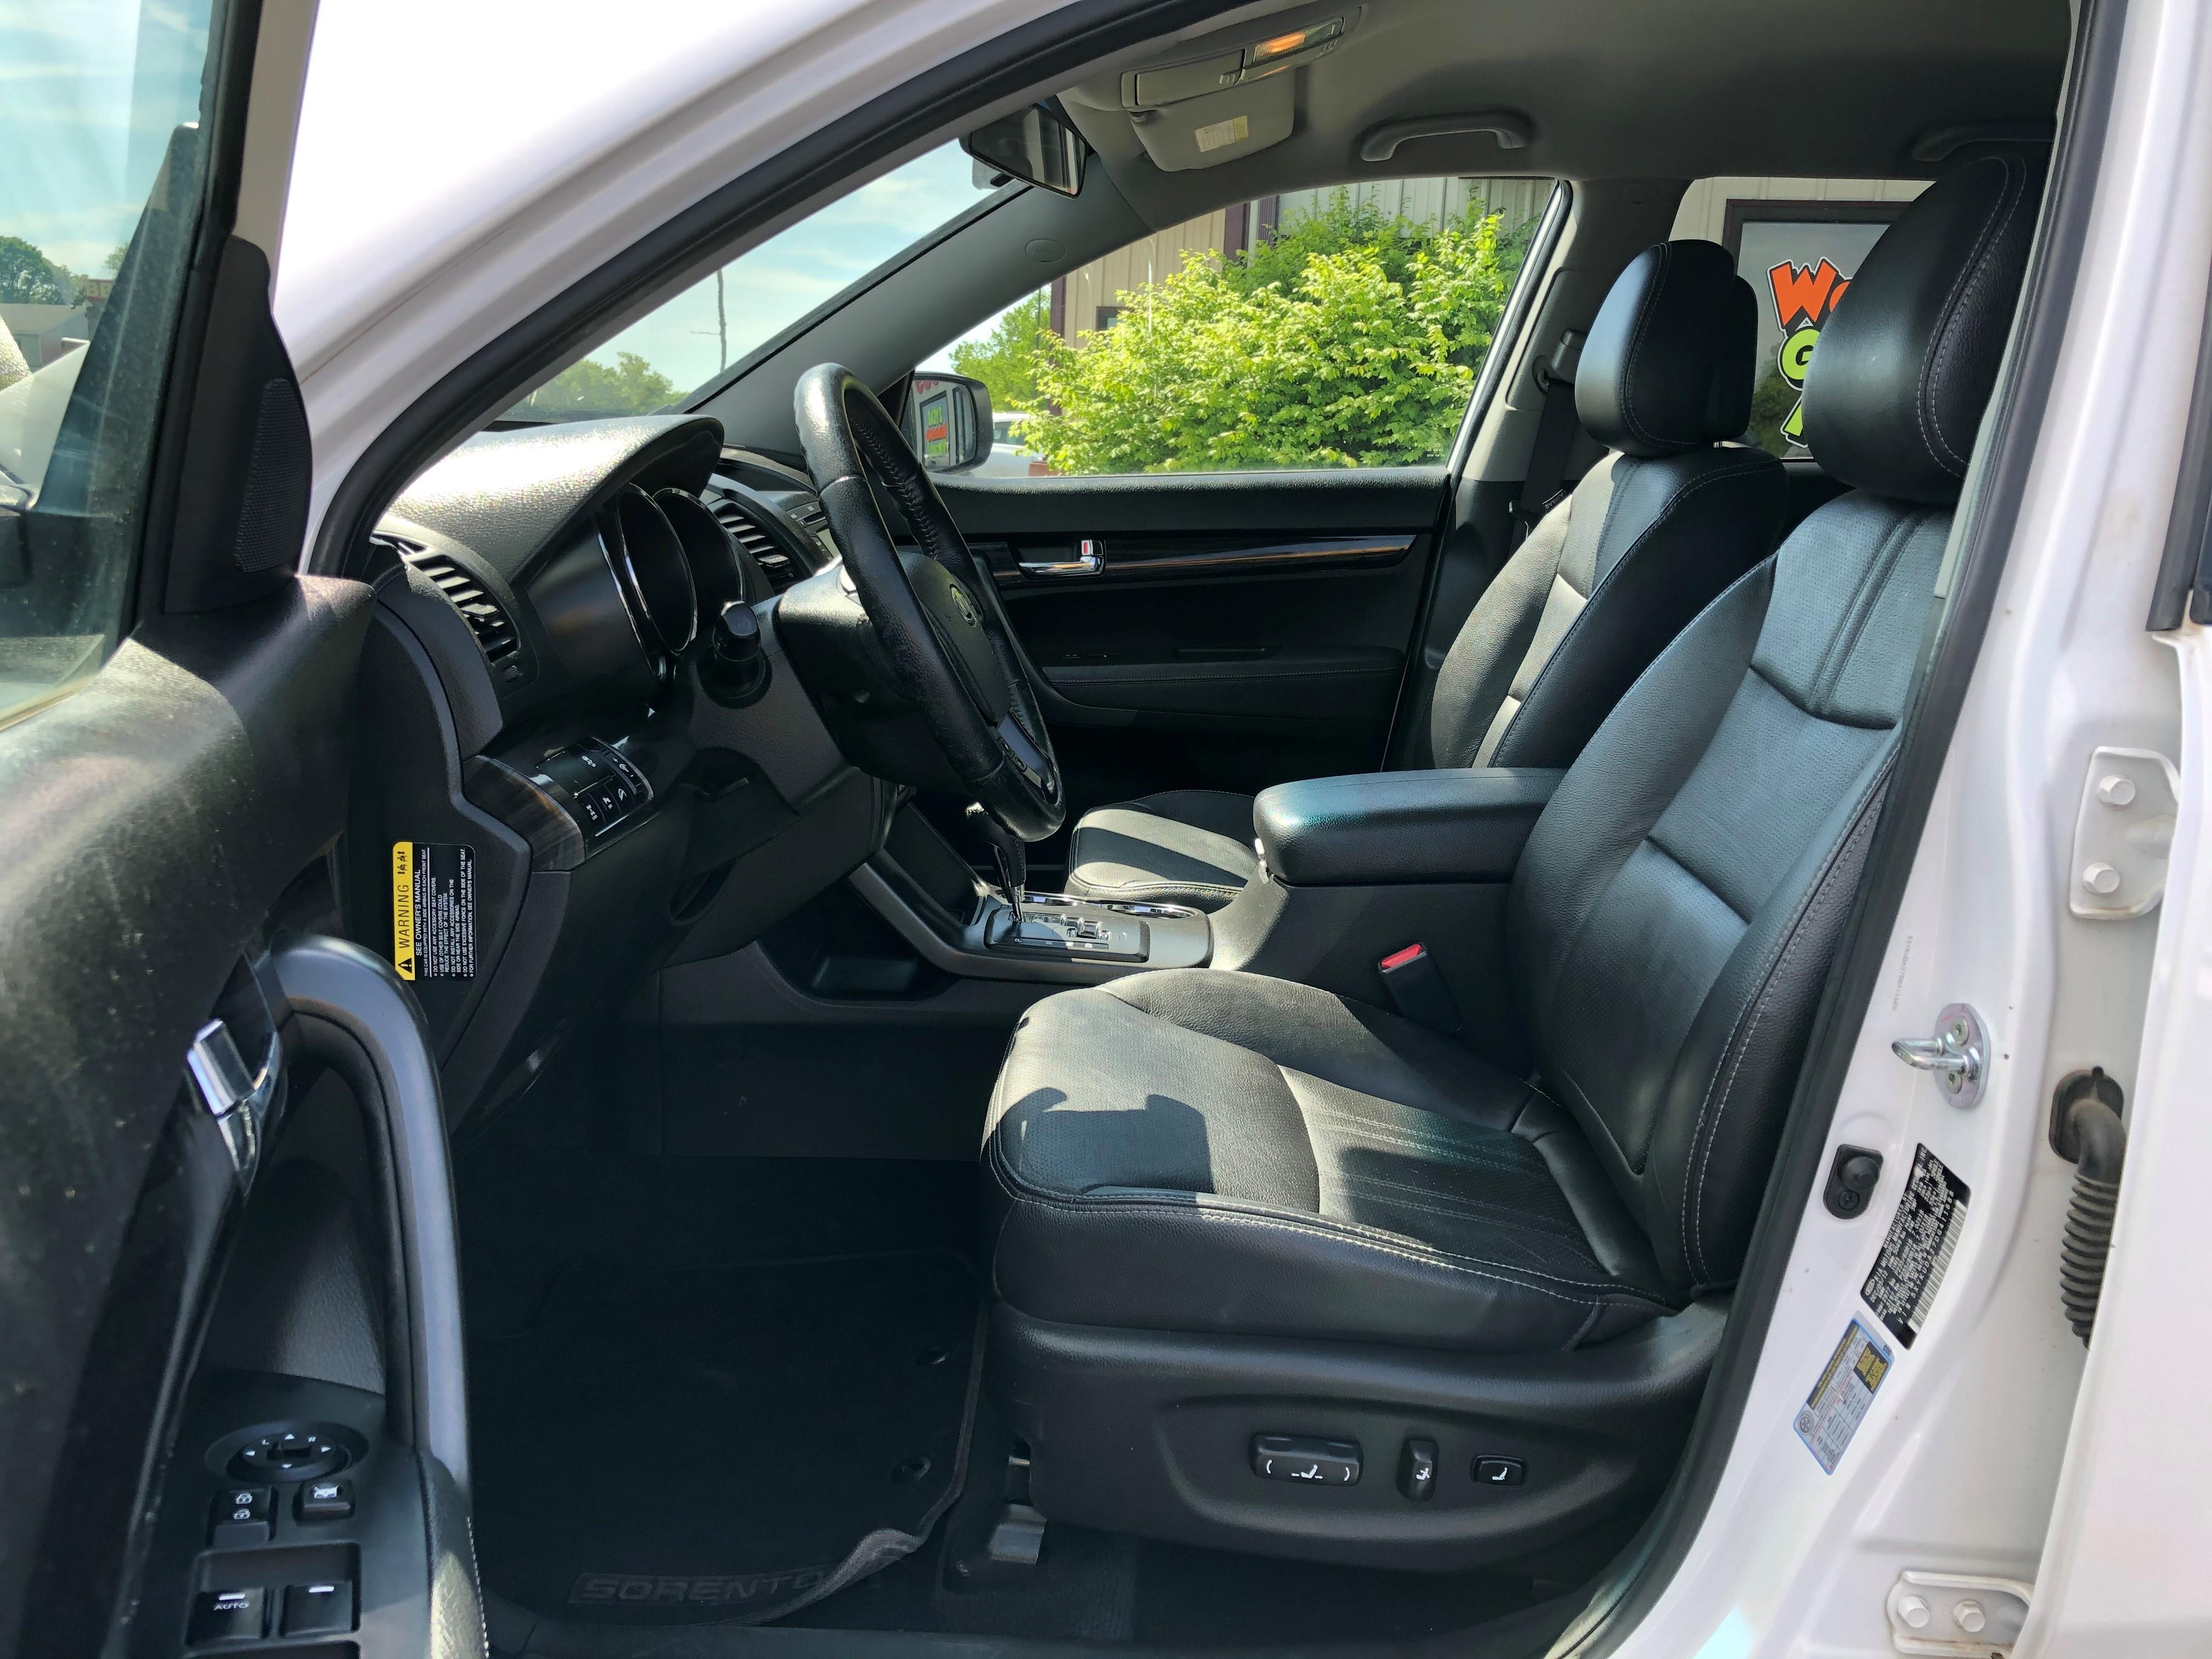 used vehicle - SUV Kia Sorento 2013